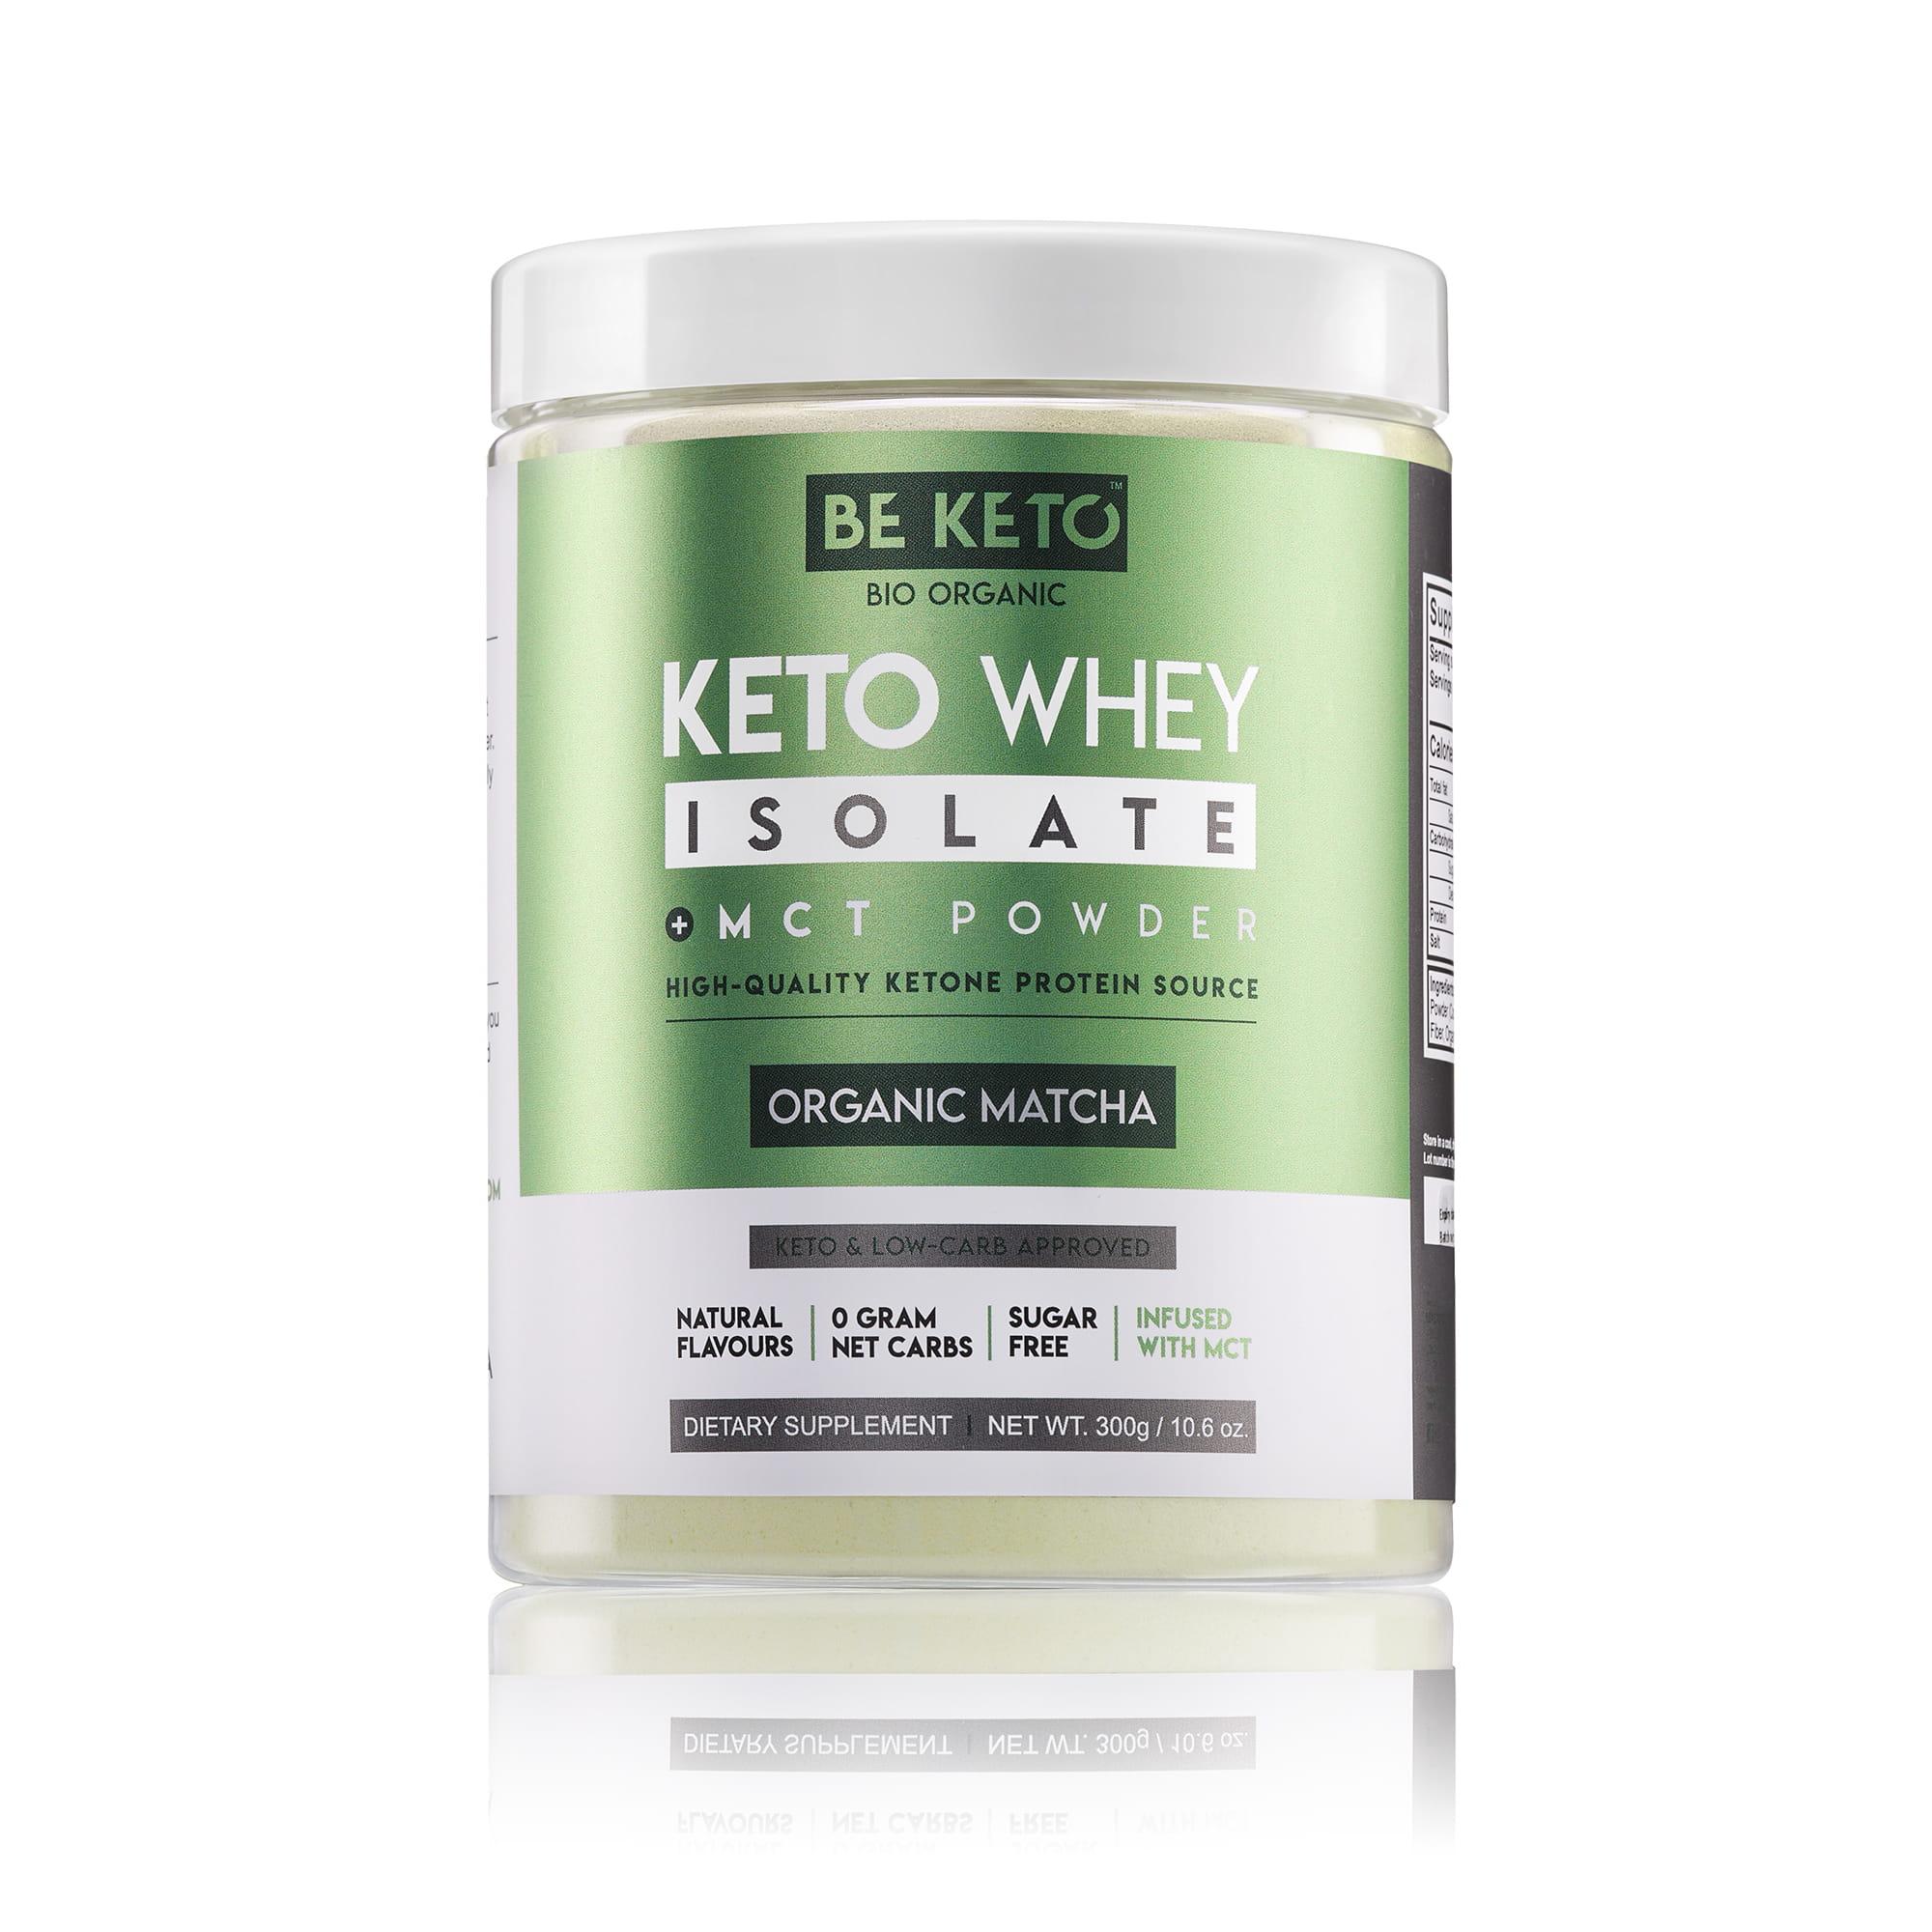 Keto Whey isolate + MCT - Organic Matcha 300G